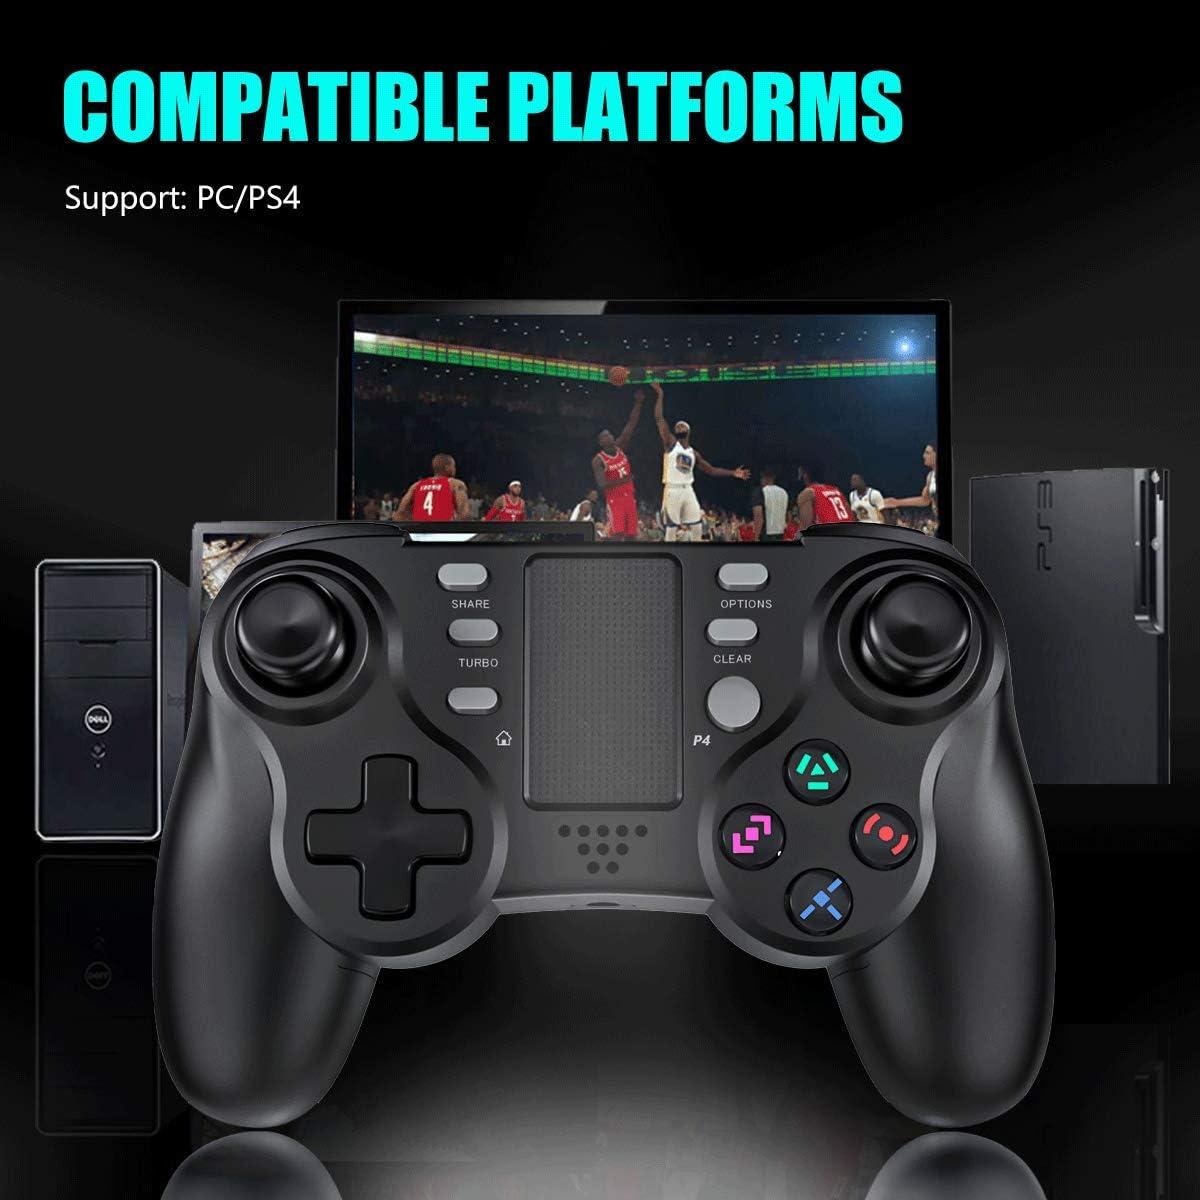 Wireless Controller de Juego Inal/ámbrico Bluetooth Joypad Distancia Joystick Gamepad Controledor de Doble vibraci/ón Compatibile con PS4//PS4 Slim// PS4 Pro//PS3 TUTUO Mando para PS4